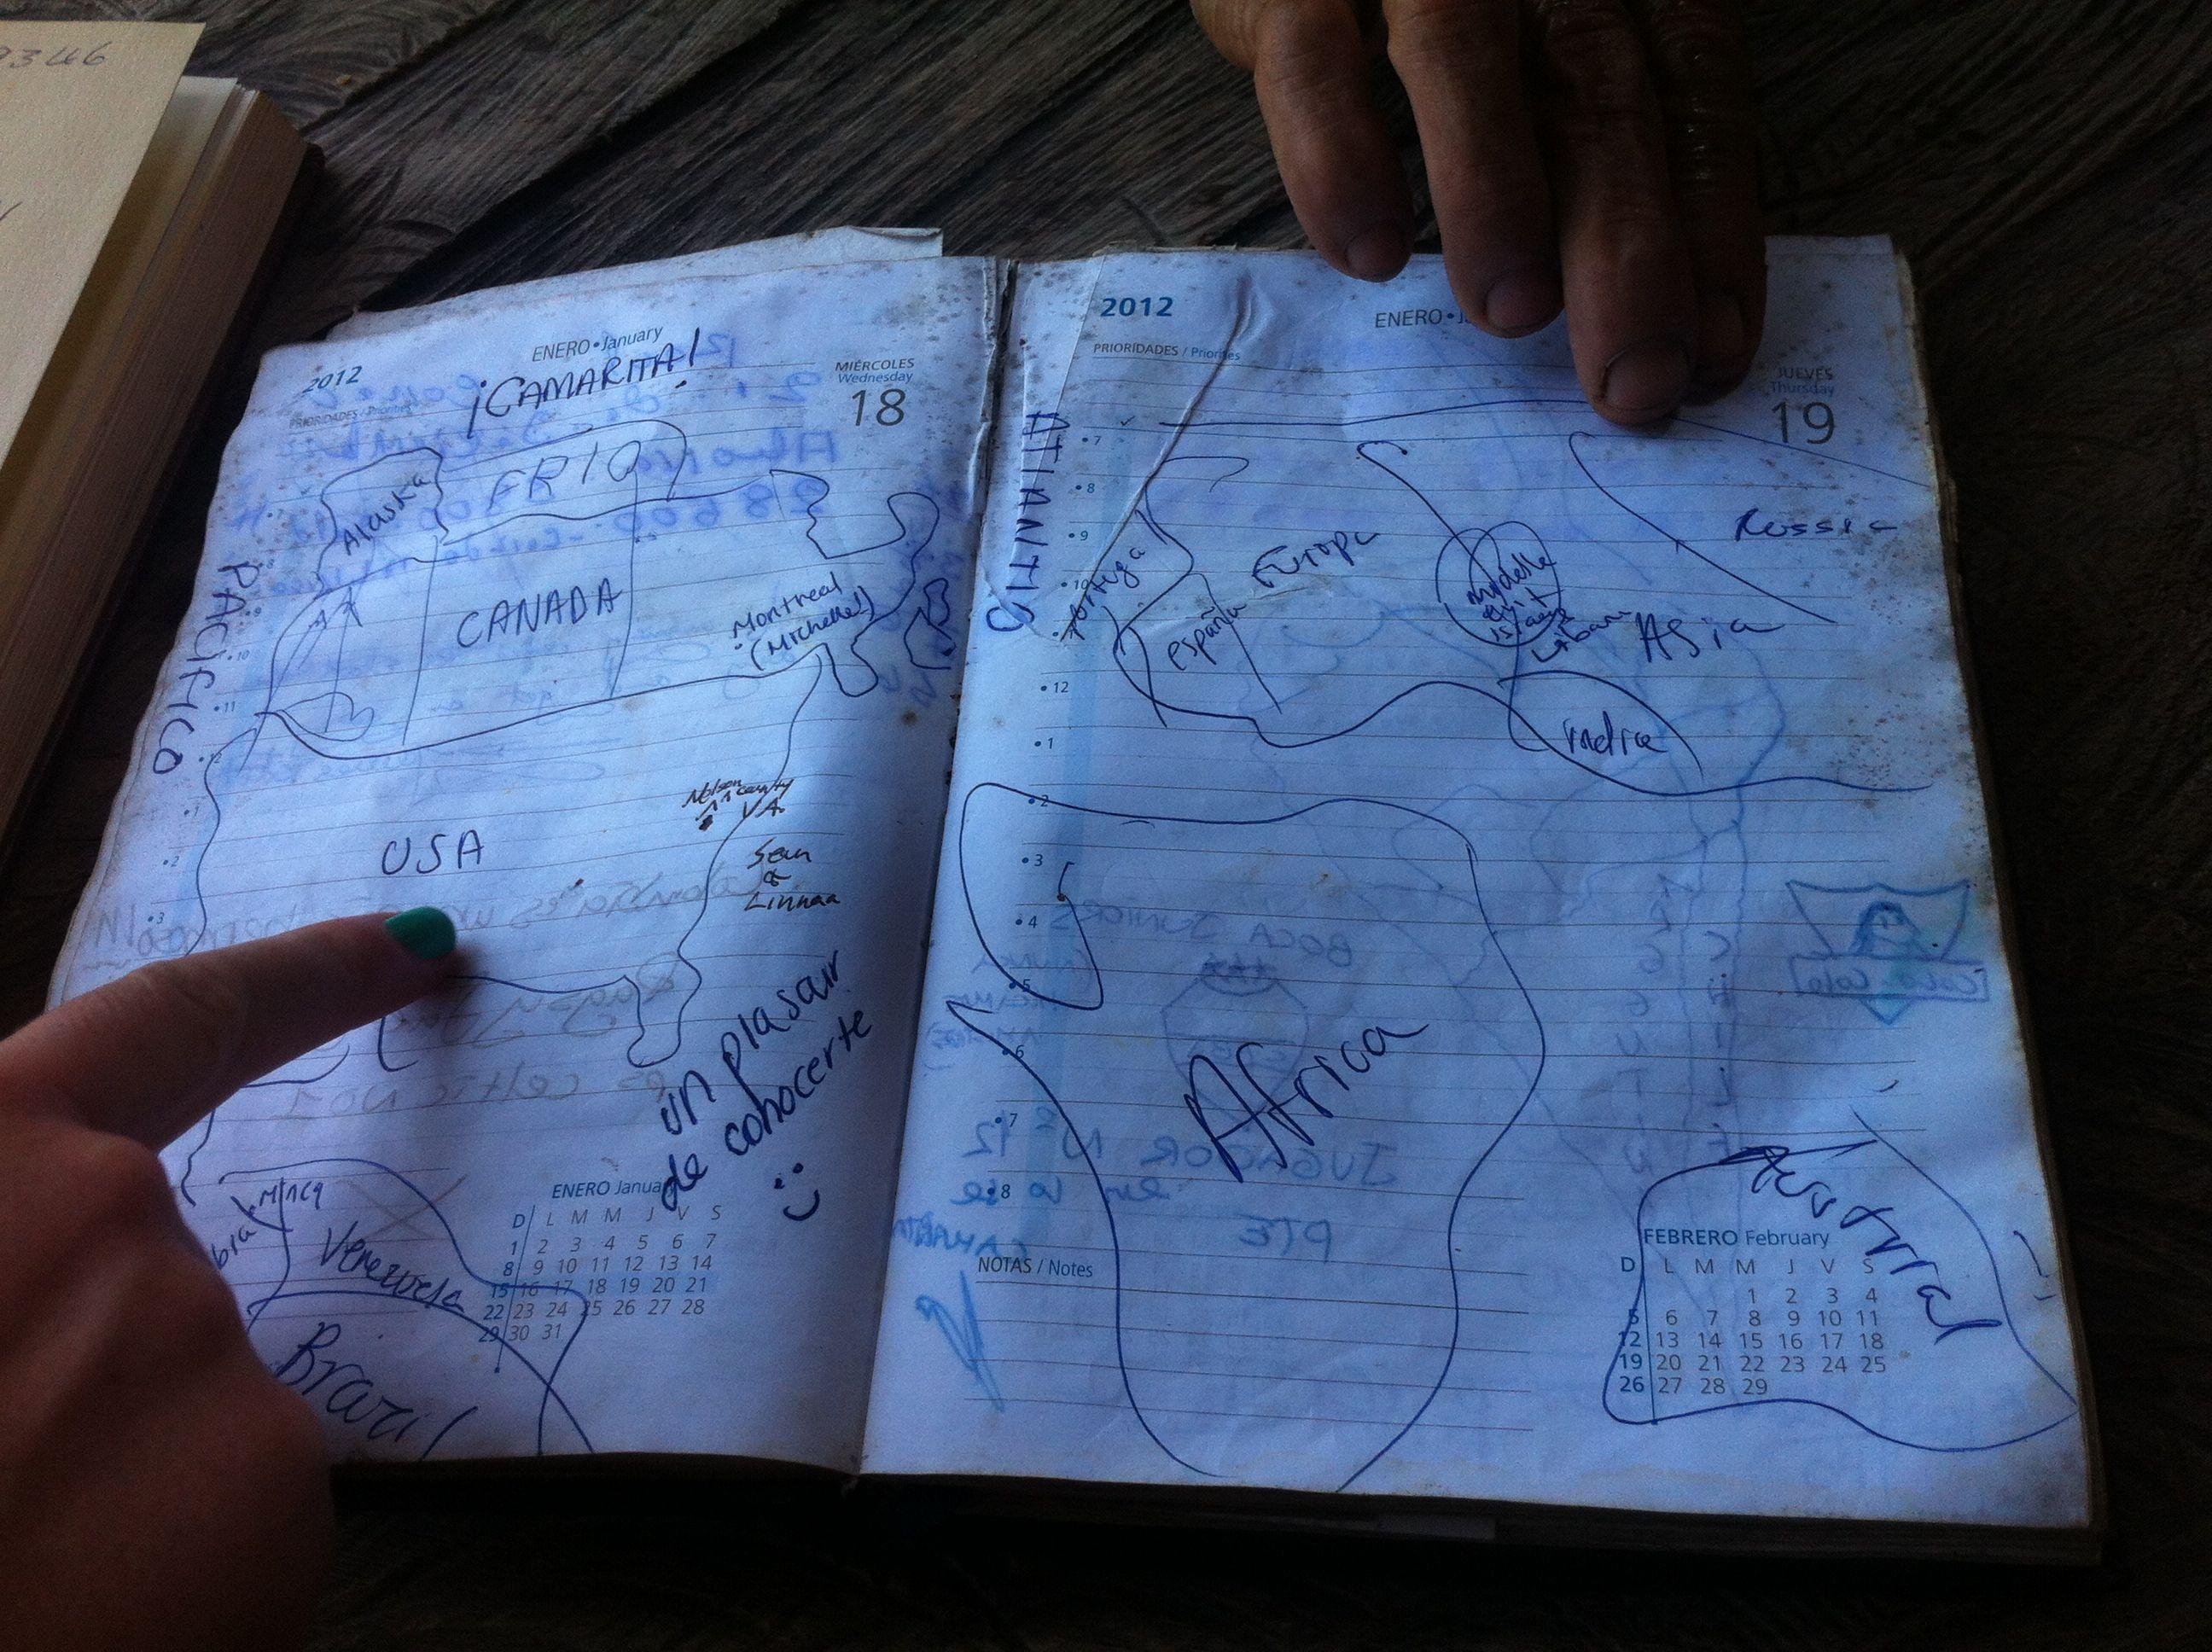 diners sketch their origins